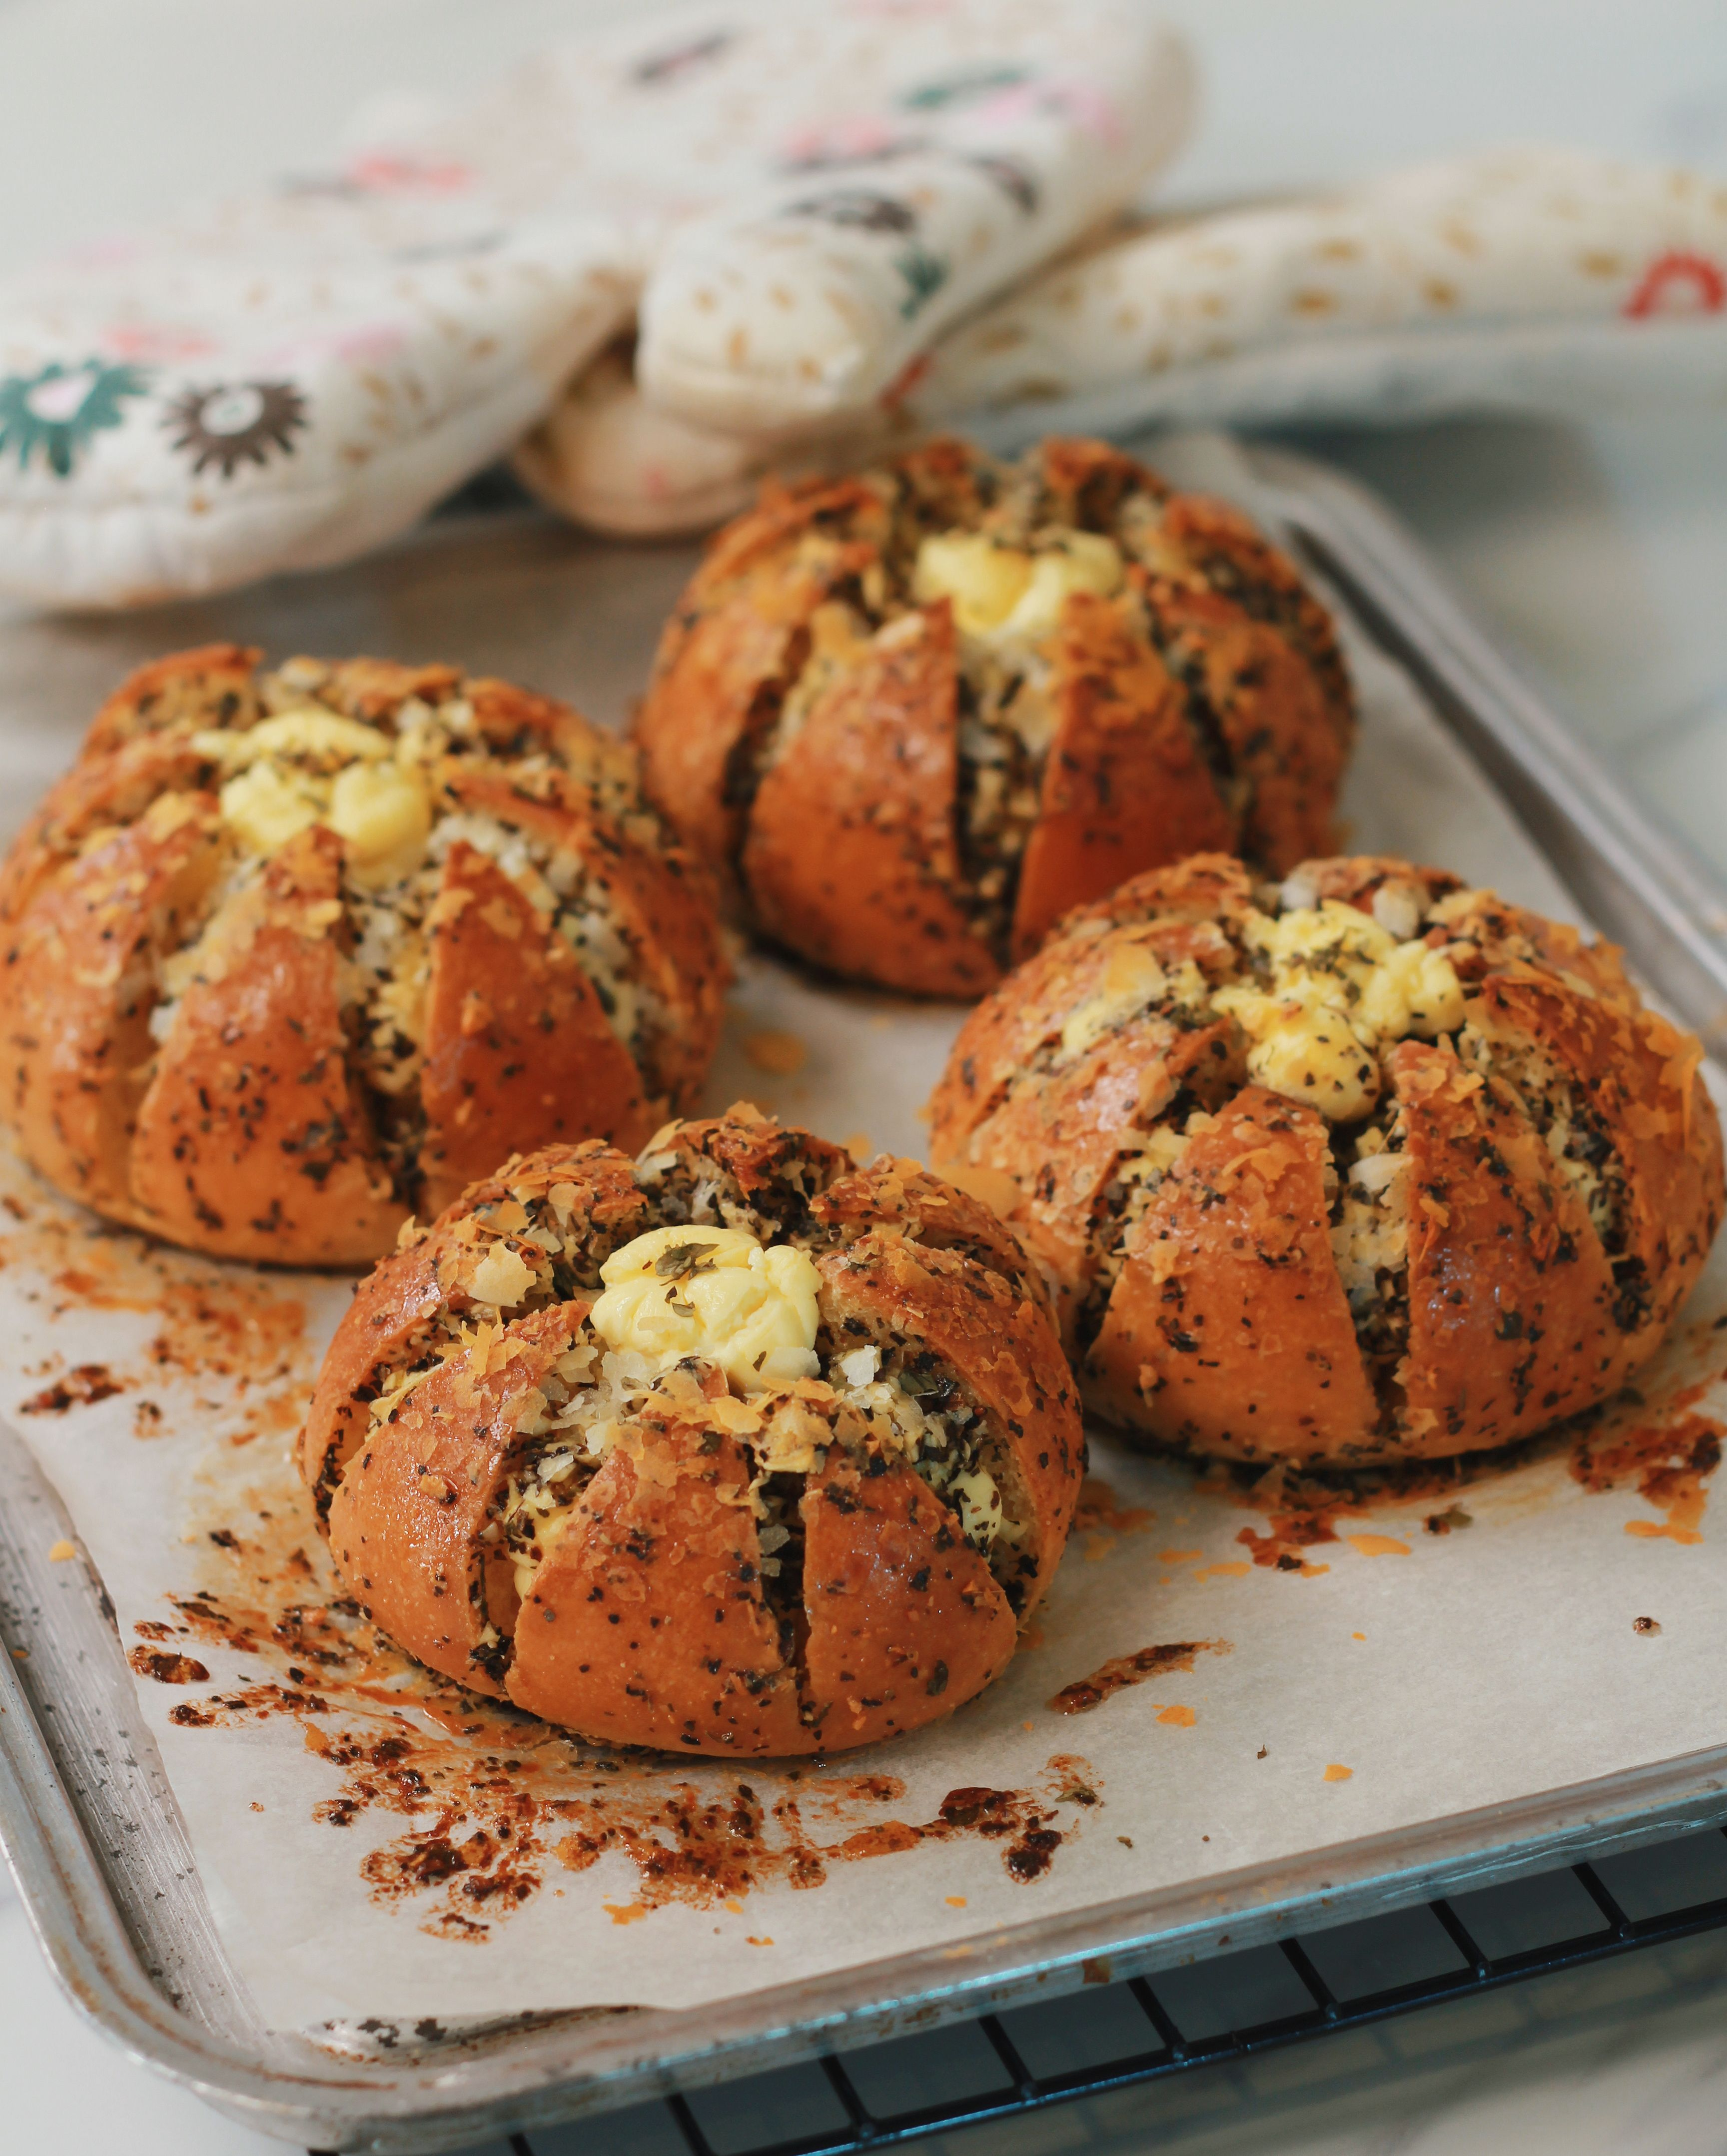 Cream Cheese Garlic Bread 육쪽마늘빵 Recipe In 2020 Garlic Cheese Bread Garlic Bread Cream Cheese Bread